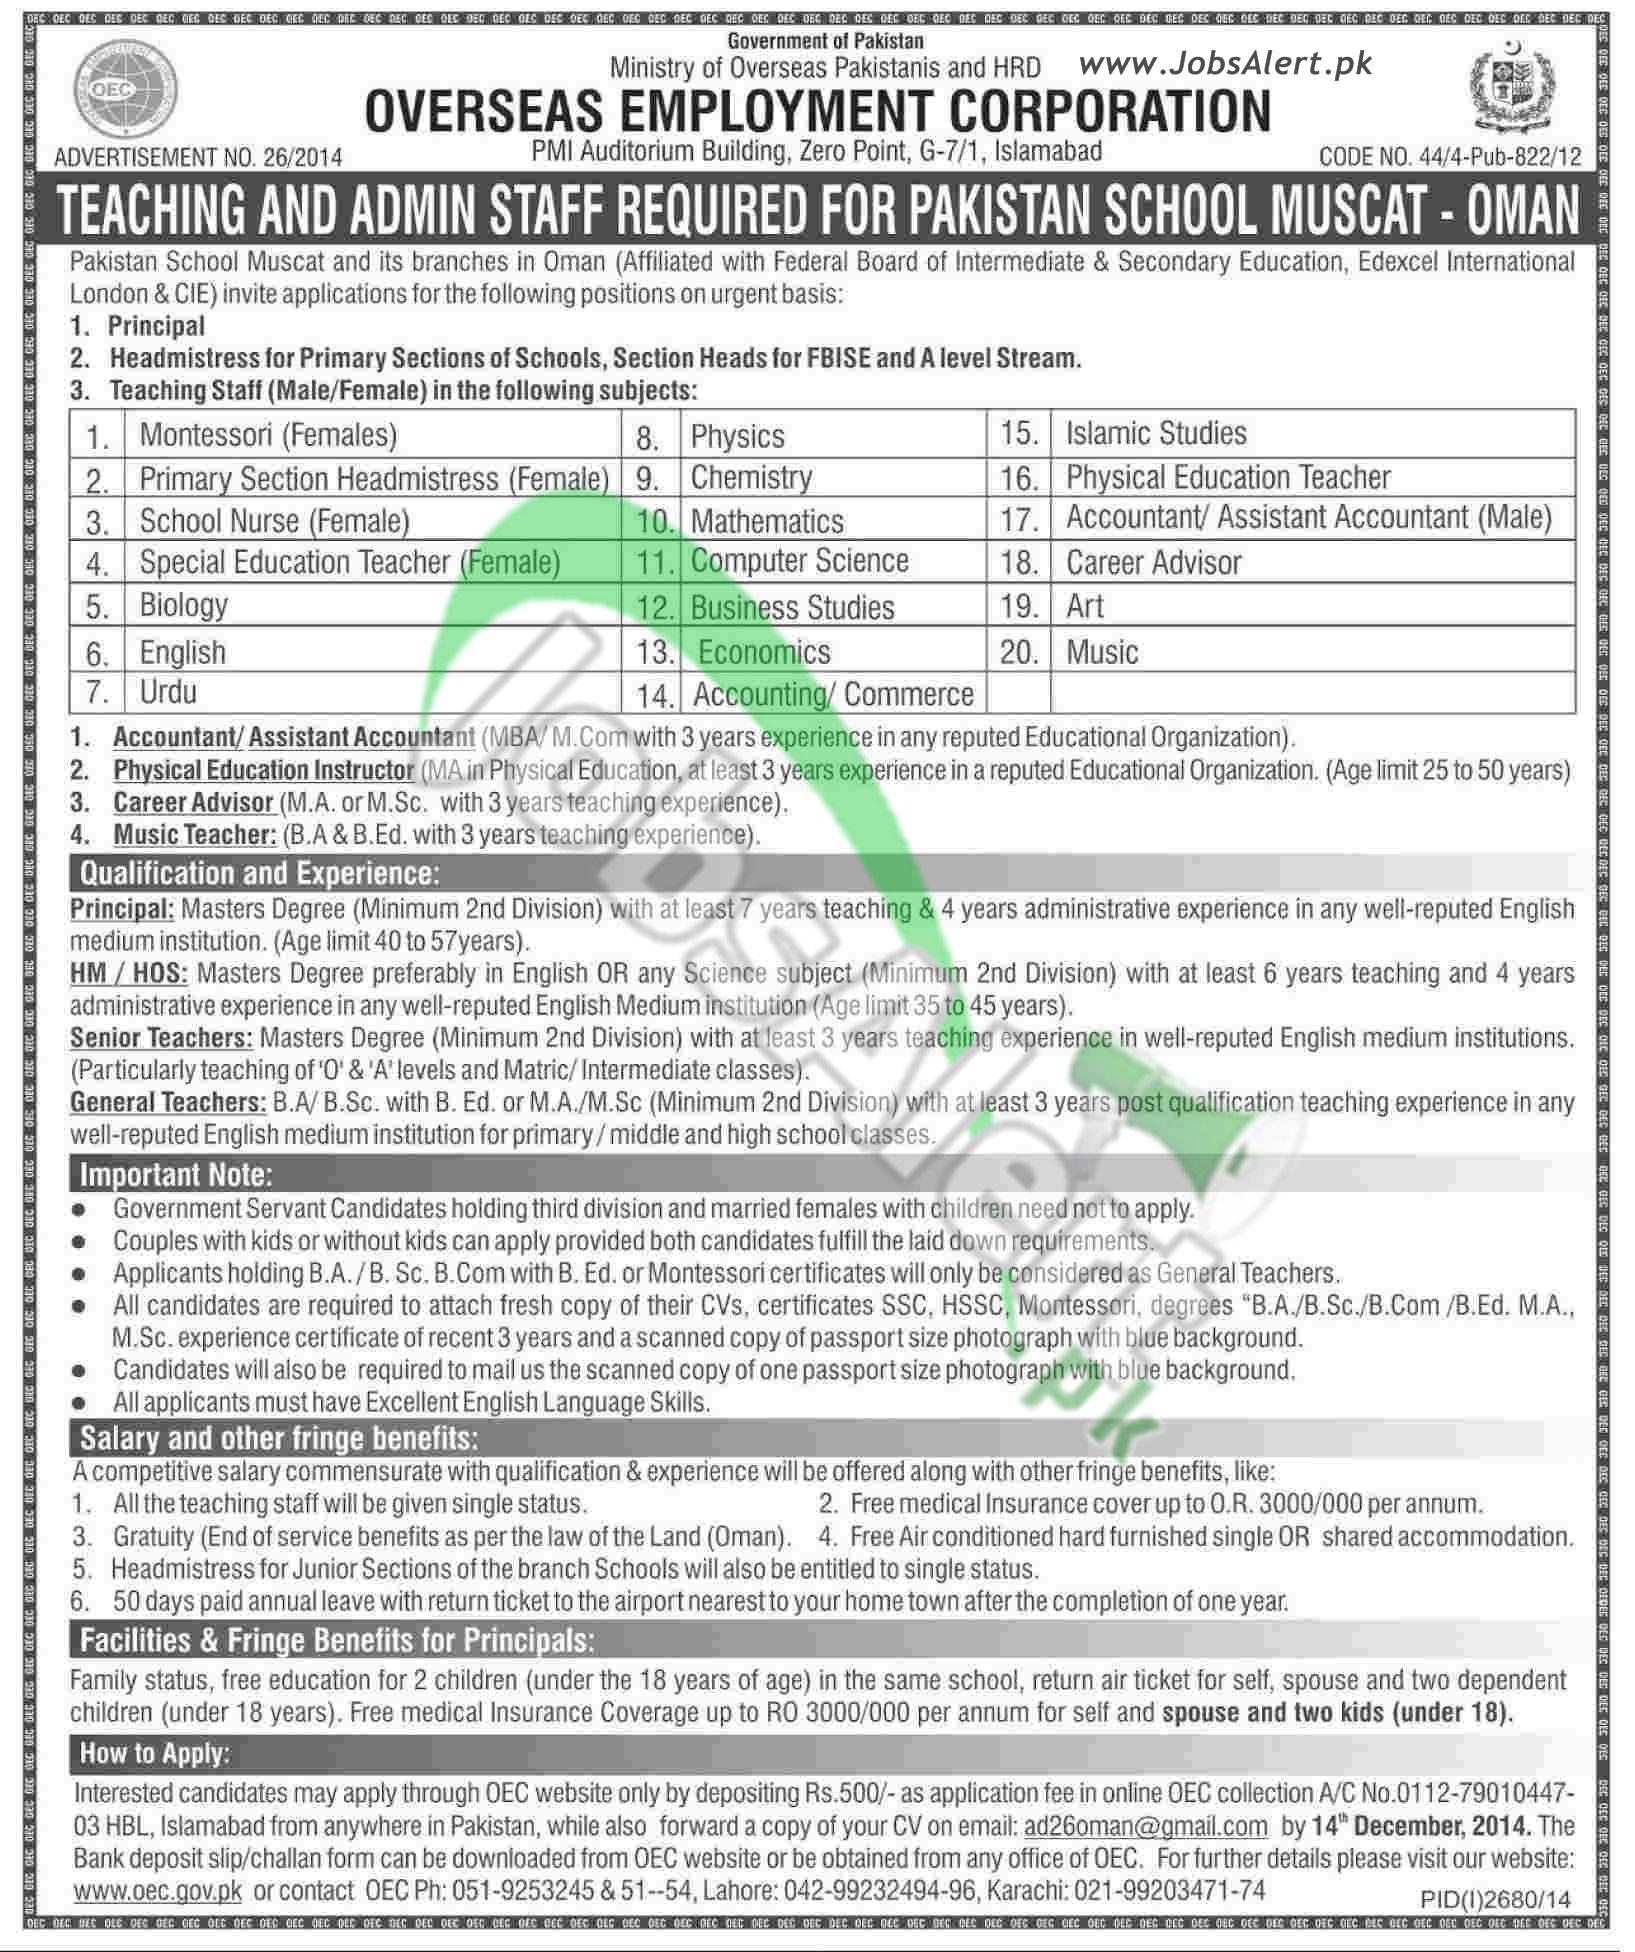 overseas employment corporation jobs 2014 teaching admin staff